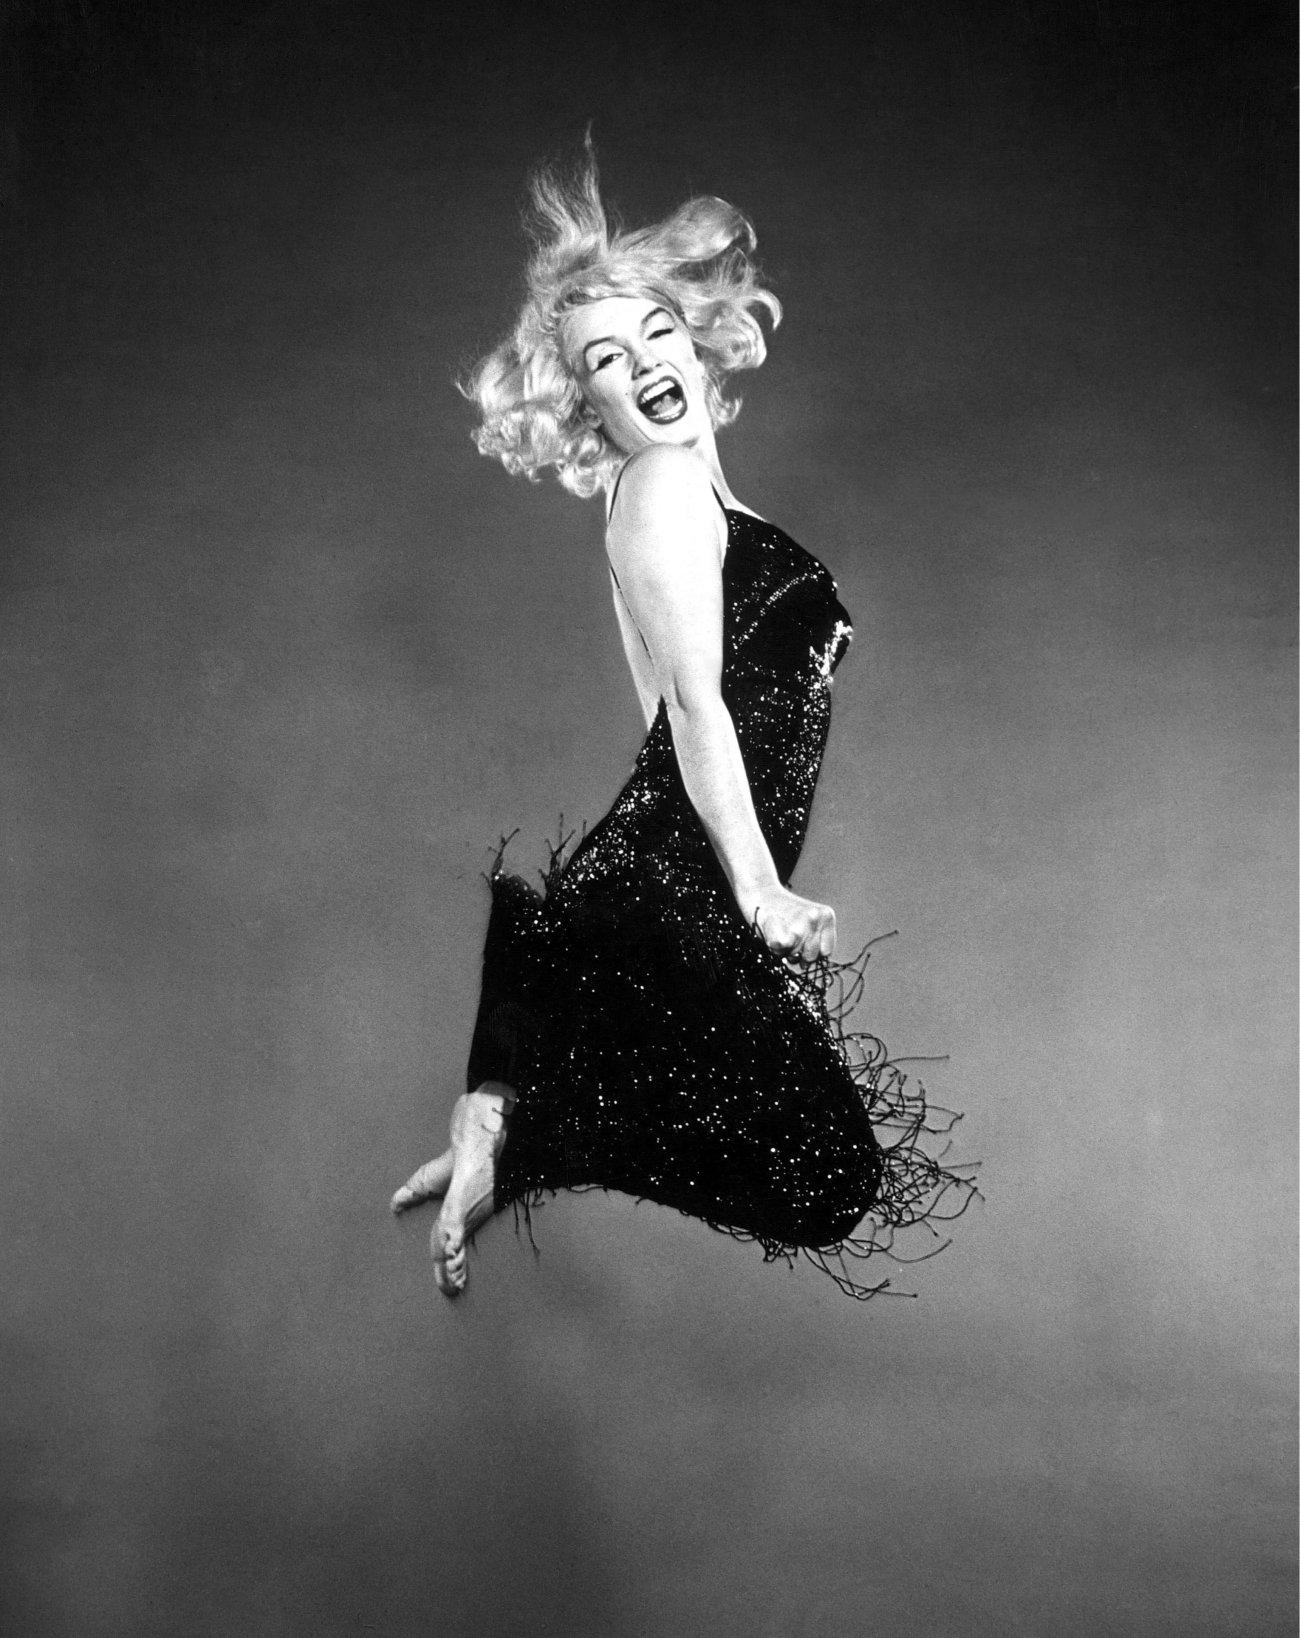 Philippe Halsman,Jumpology, 1959.